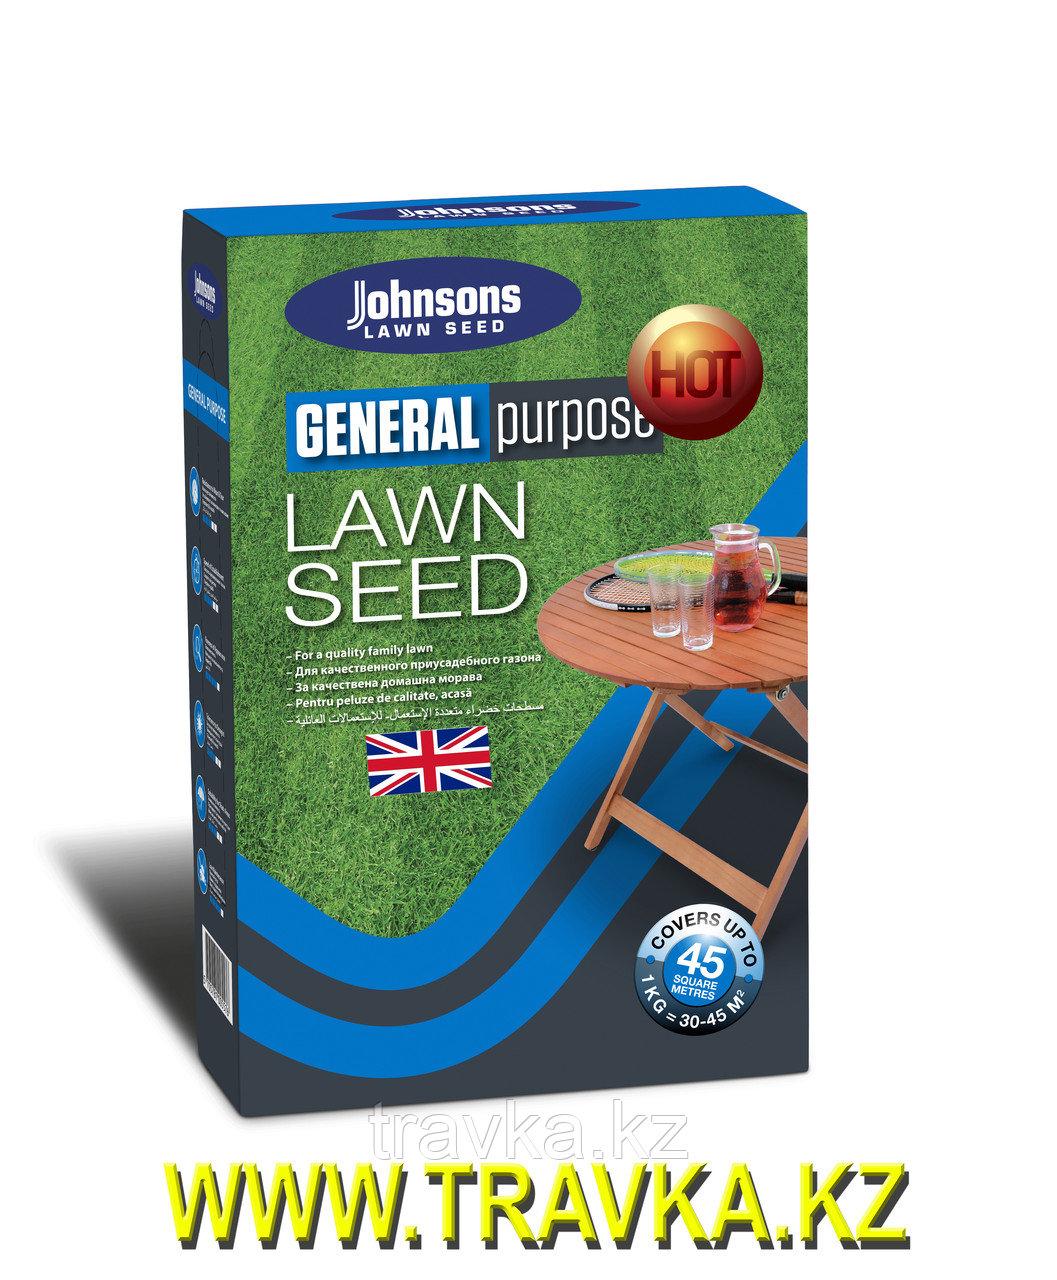 "Газонная трава ""GENERAL PURPOSE"" JOHNSONS в коробках 1 кг"